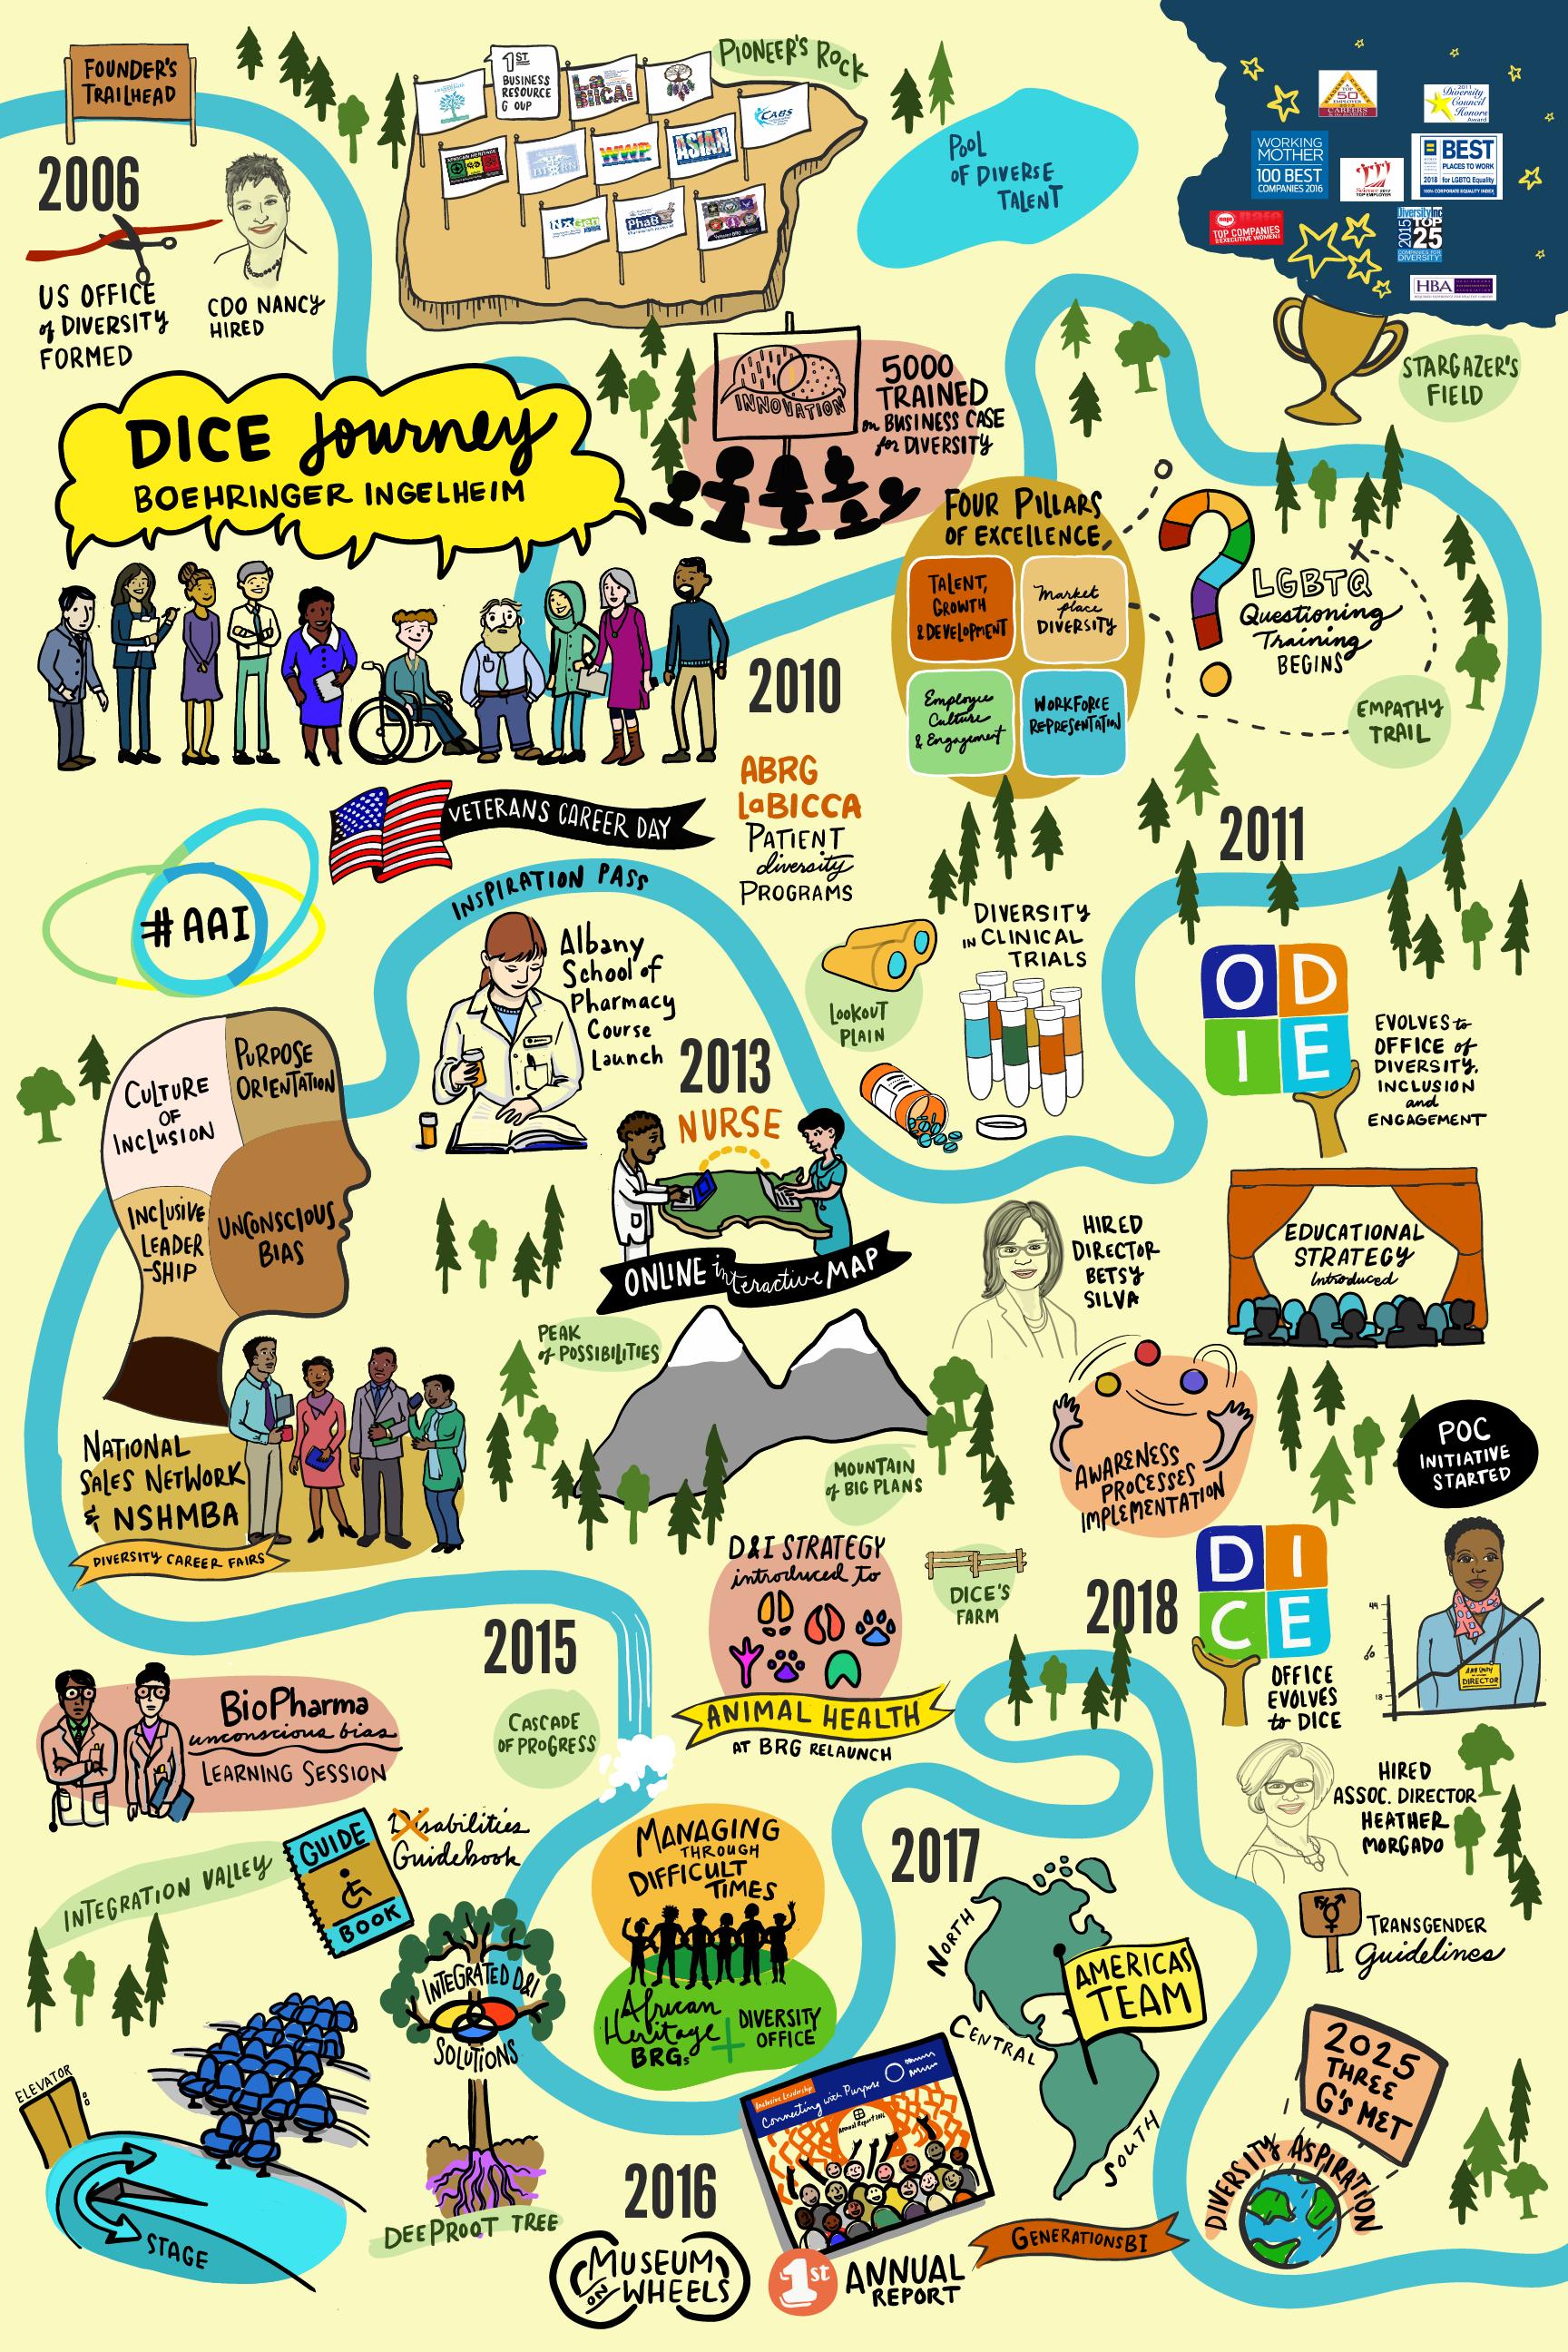 Boeringher Ingelheim Diversity Journey Illustration